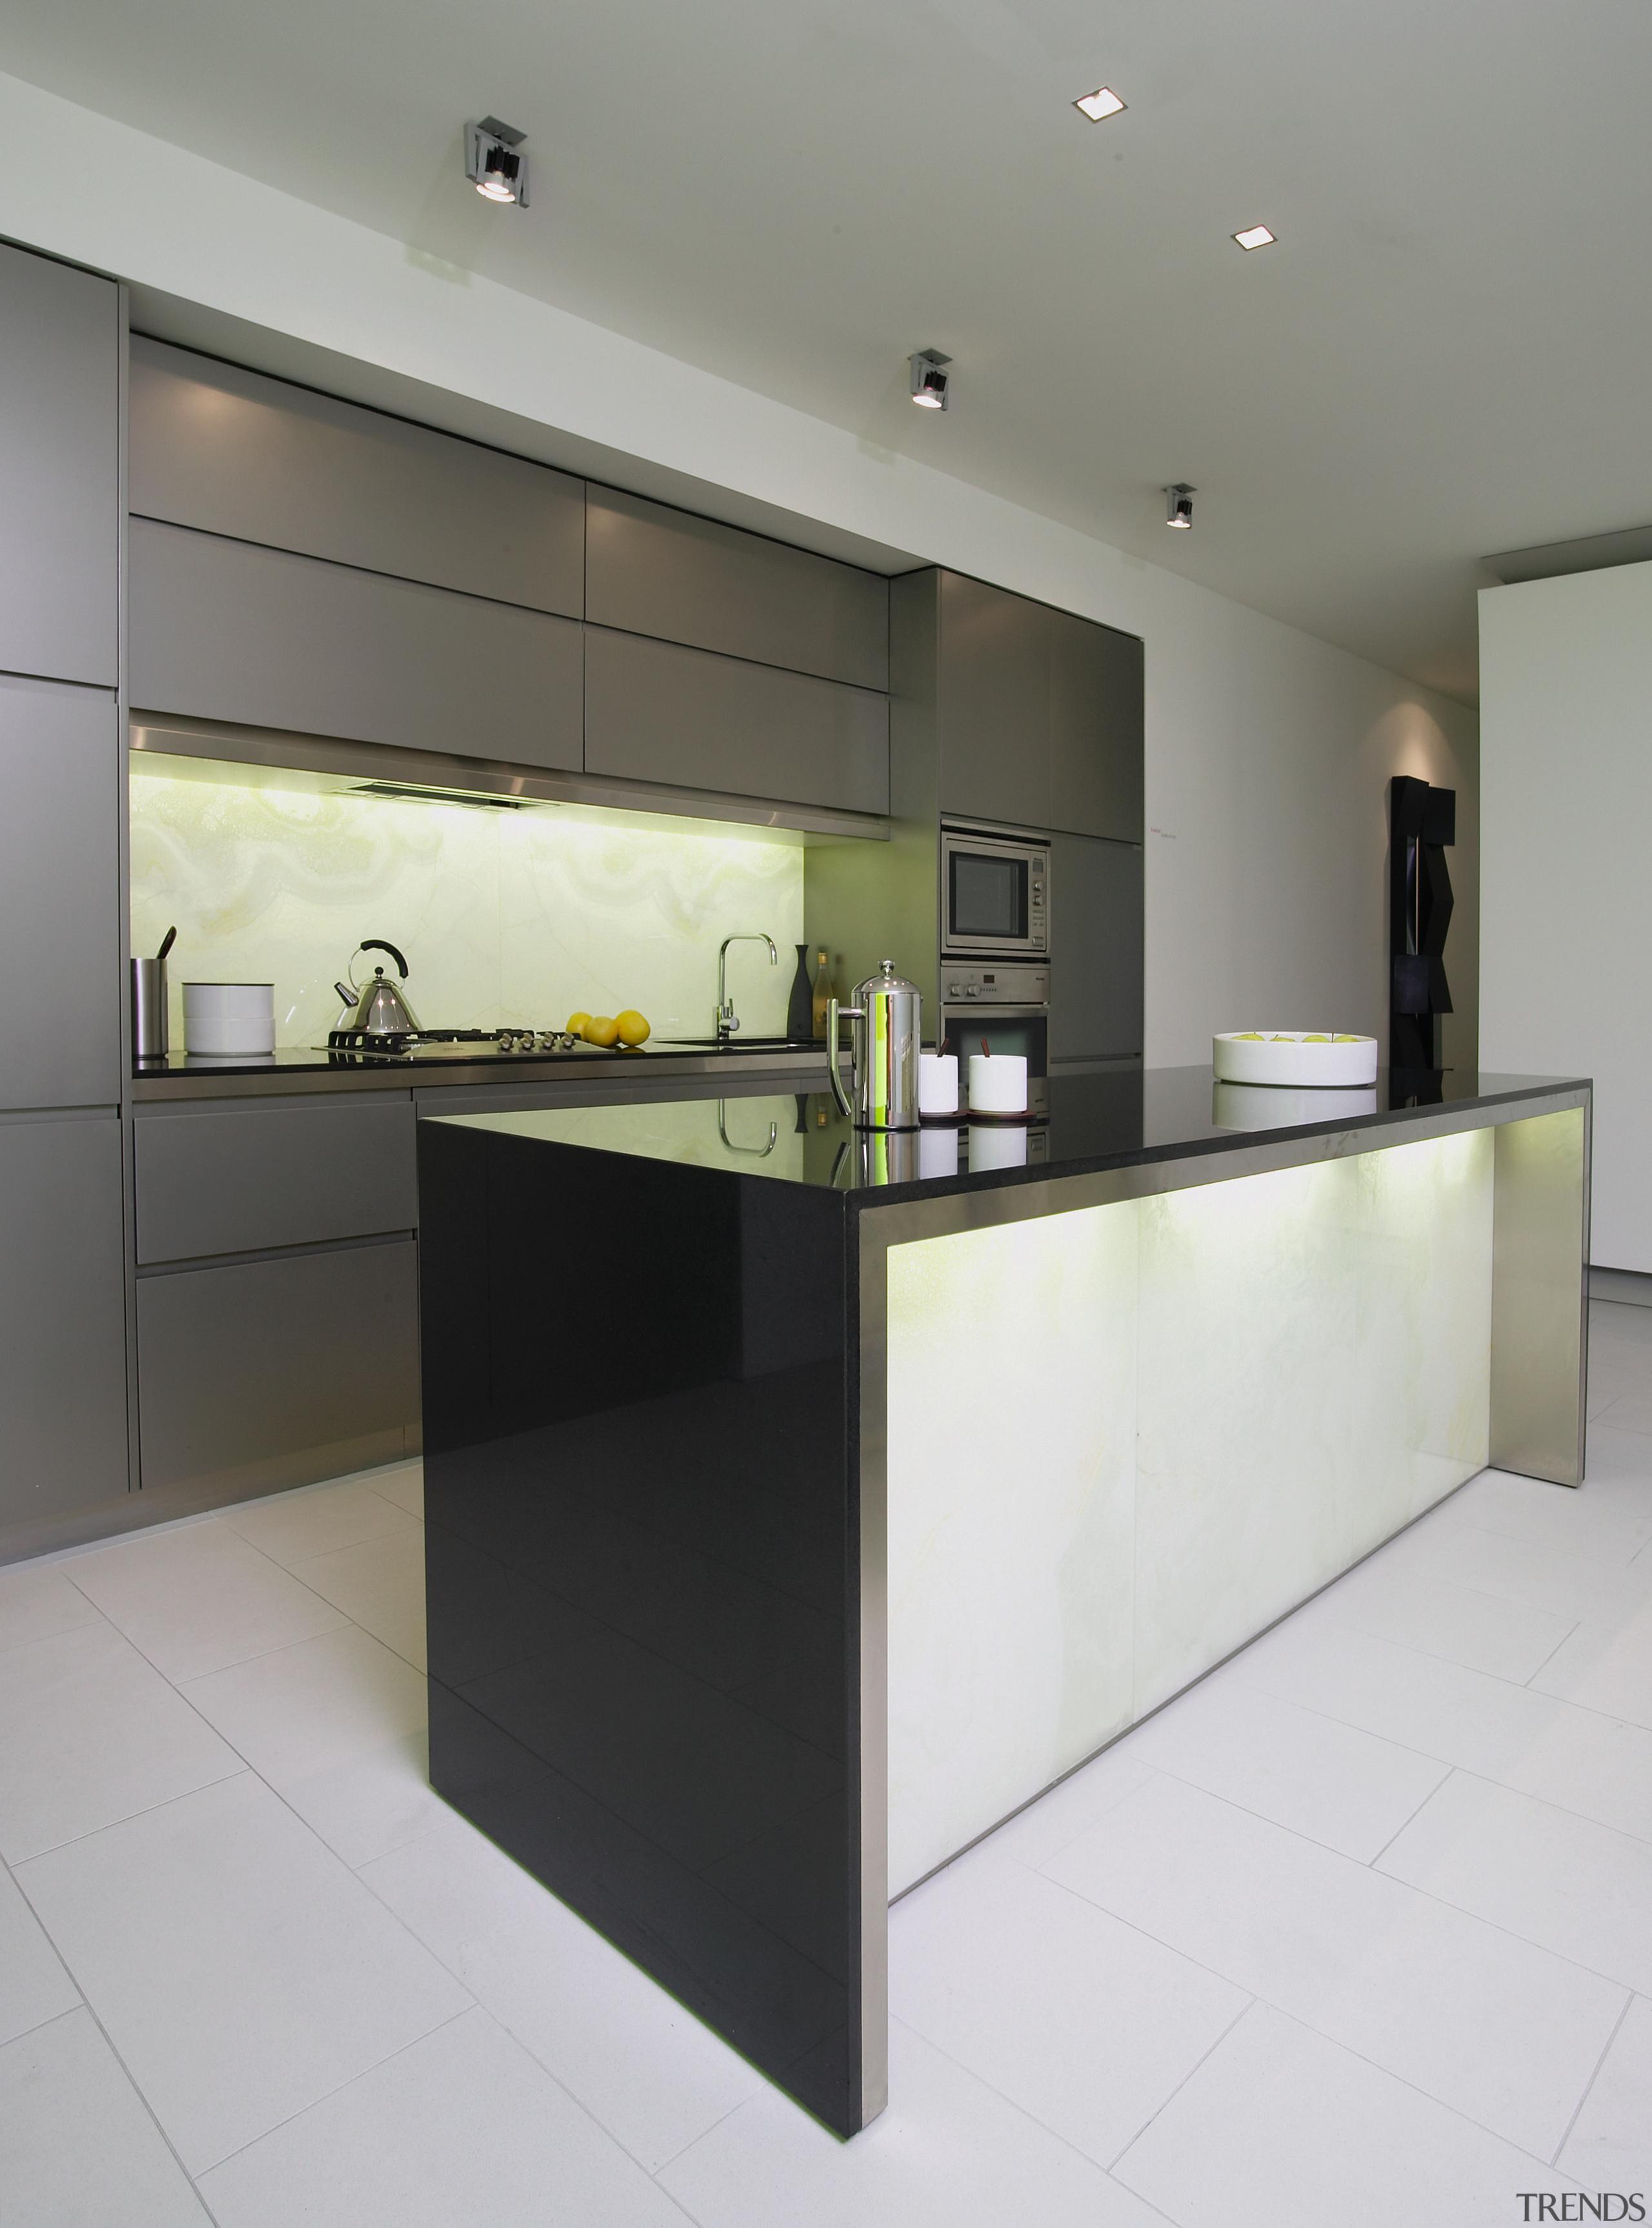 view of the quantum quartz black benchtop - architecture, cabinetry, countertop, floor, interior design, kitchen, product design, property, real estate, gray